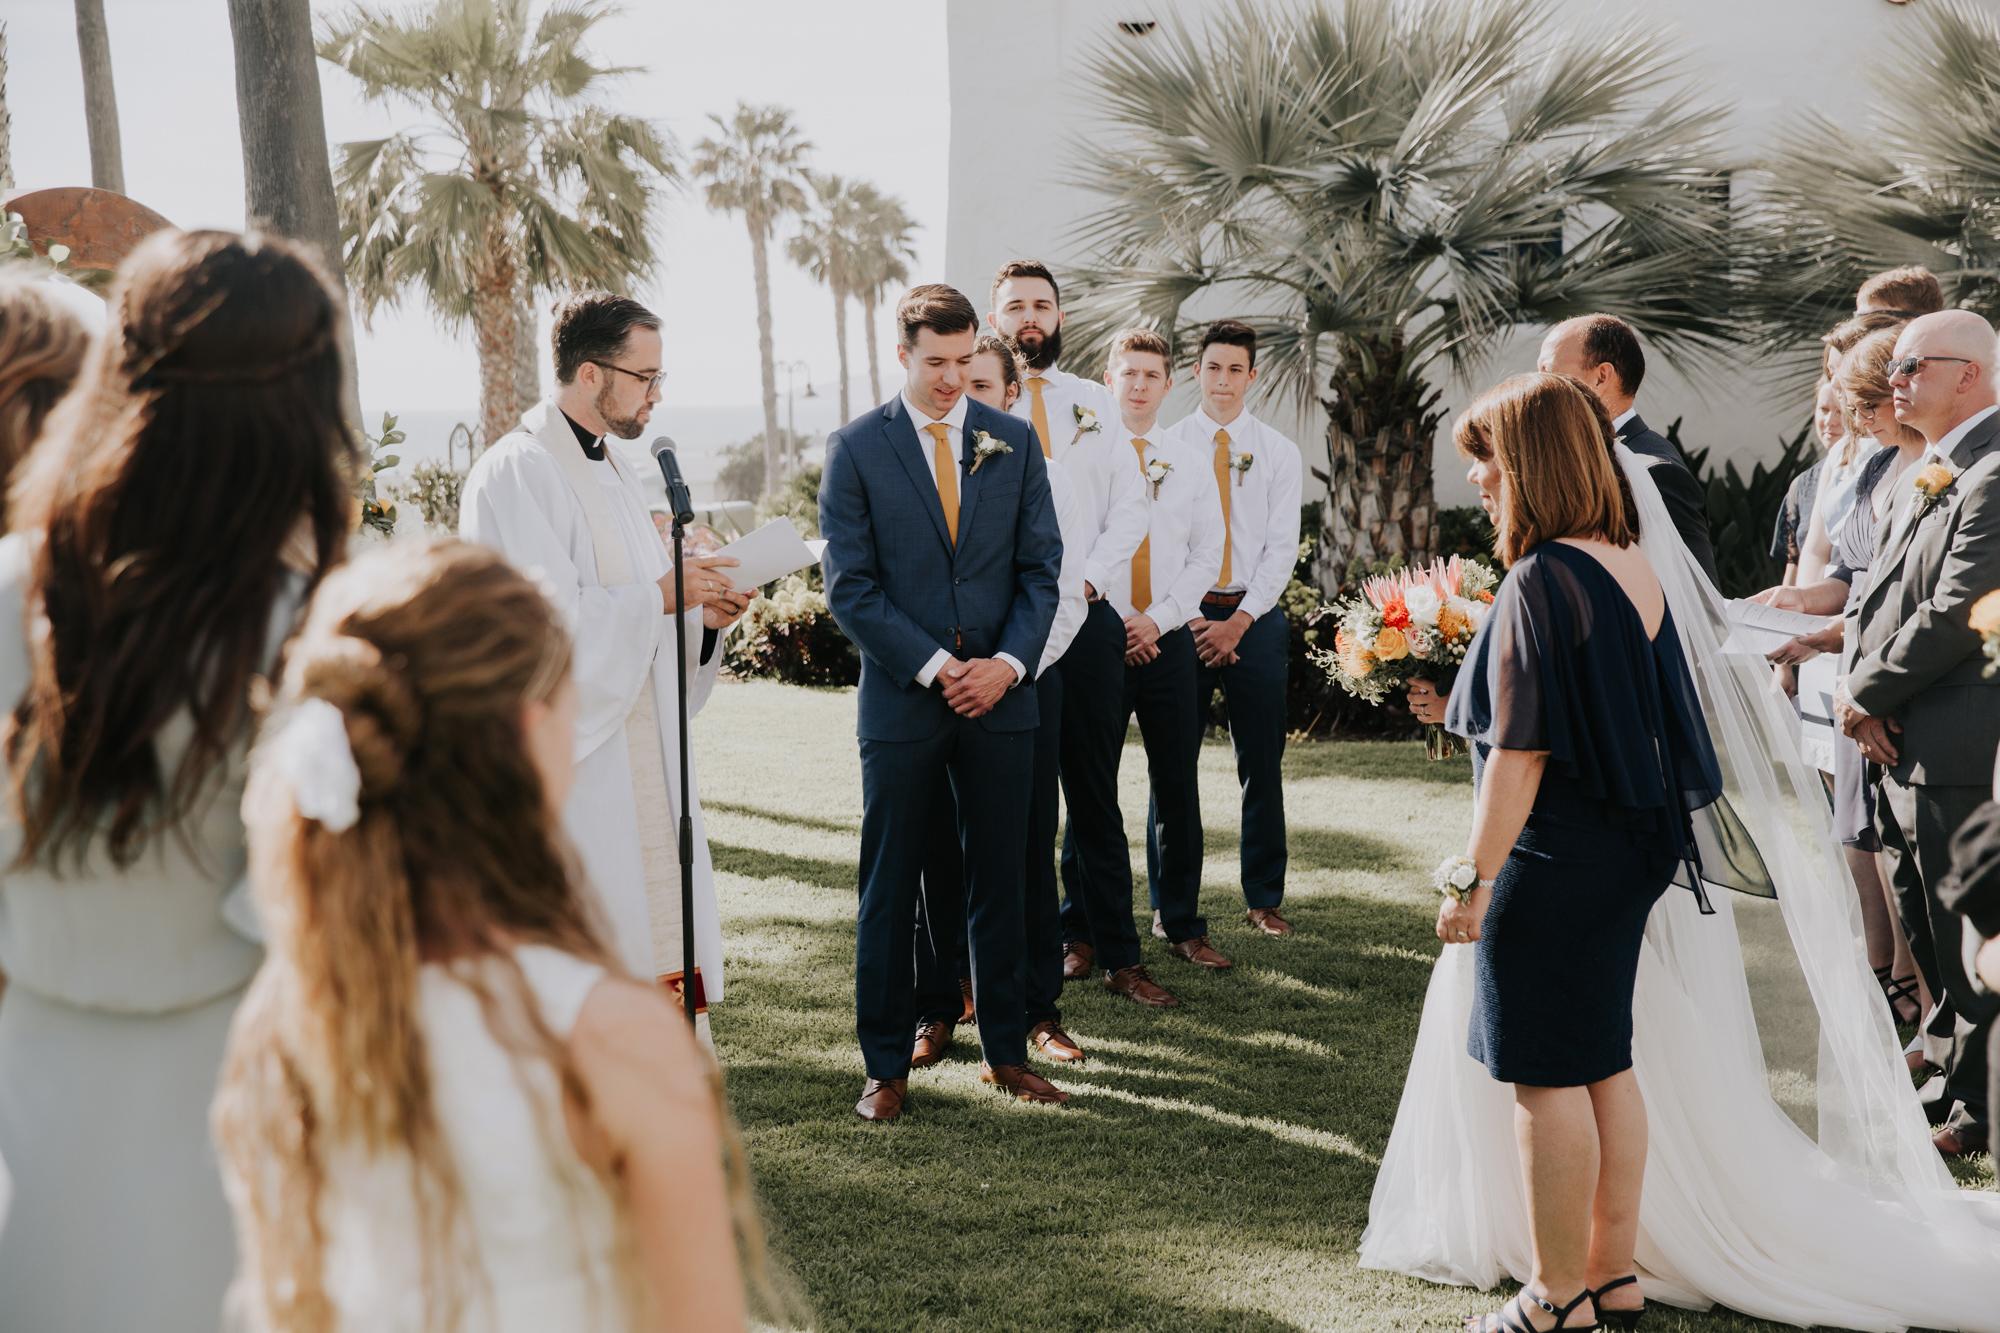 087-destination-wedding-san-clemente-california.jpg